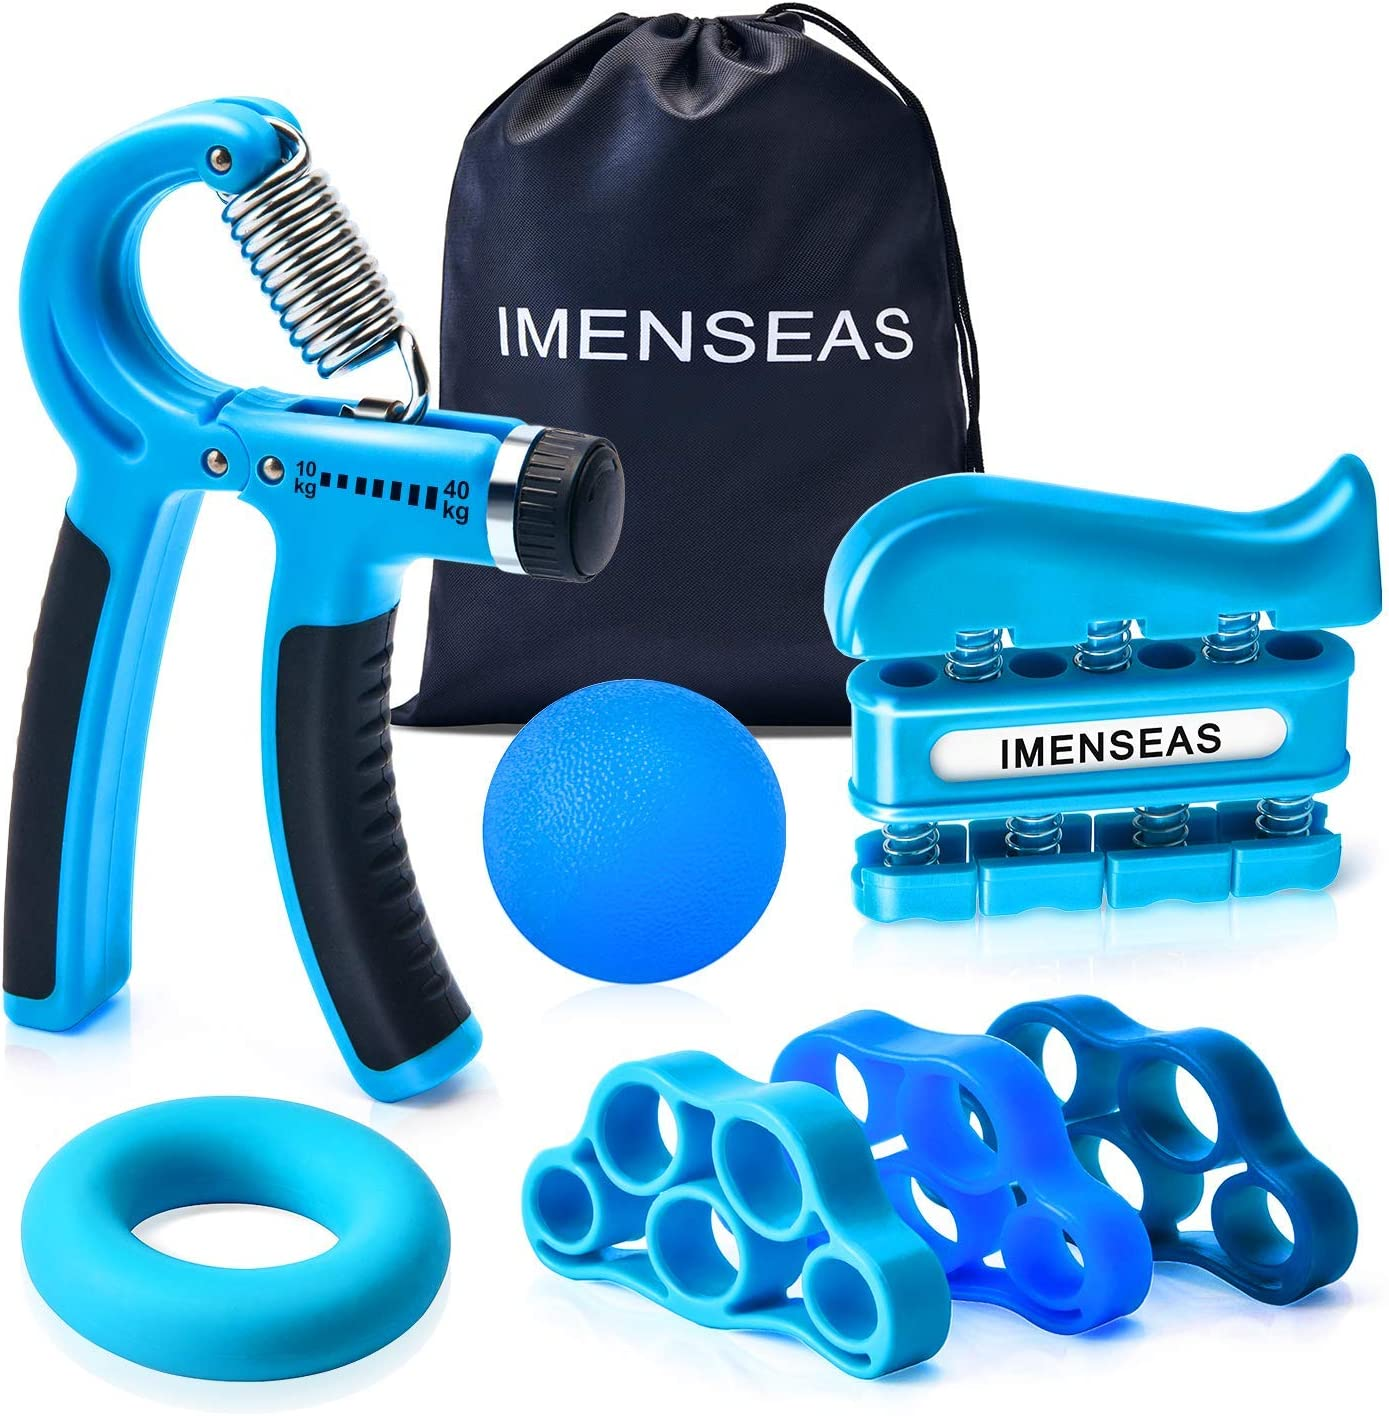 IMENSEAS Hand Grip Strengthener 7 Pack Adjustable Hand Gripper, Finger Stretcher Resistance Extensor Bands, Finger Exerciser, Grip Strength Ring Stress Relief Ball for Athletes Musicians